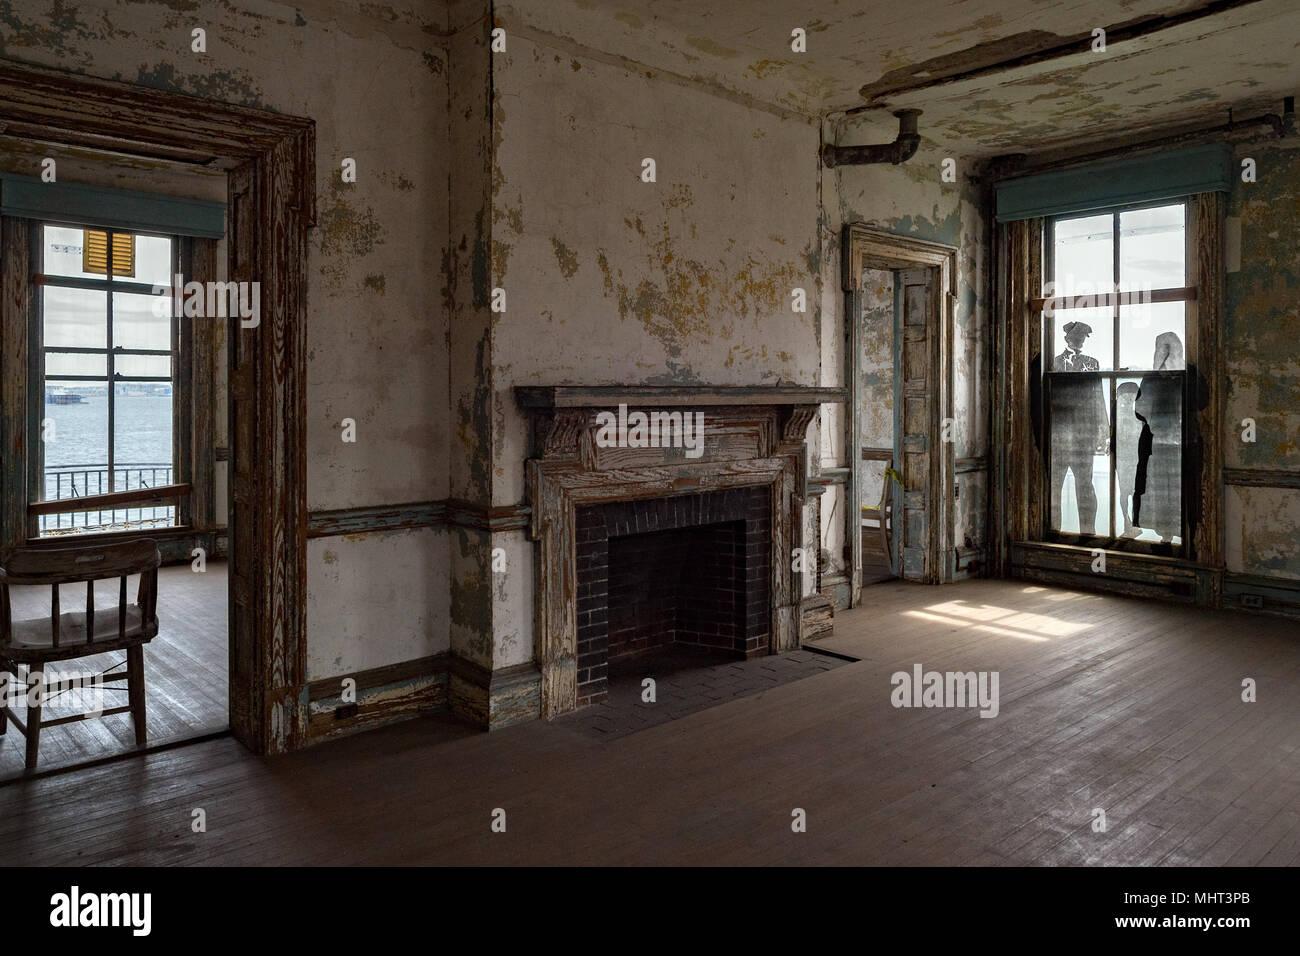 ellis island abandoned psychiatric hospital interior rooms ...